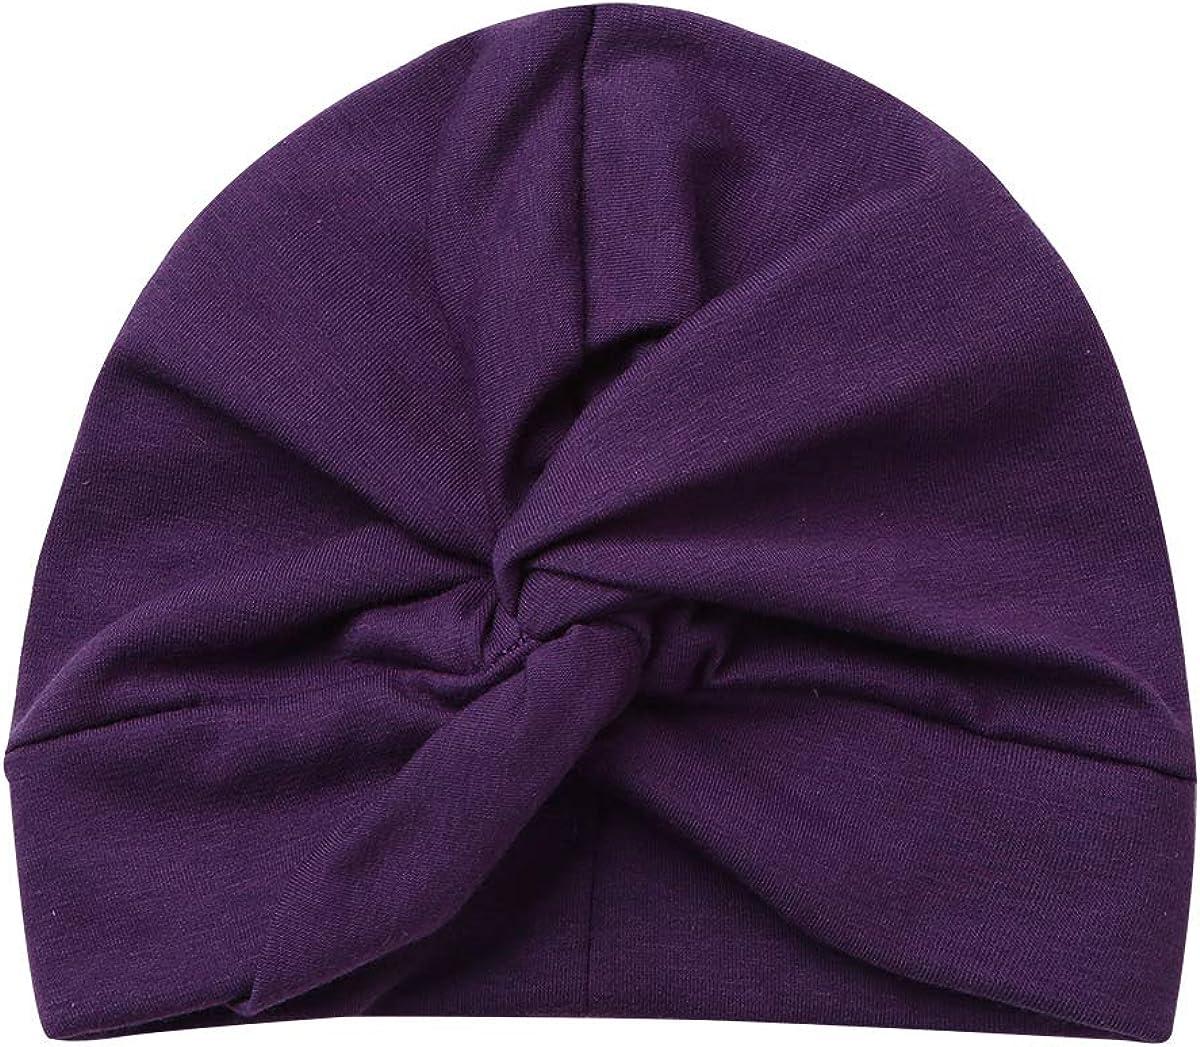 Horizon-t Donuts Cat Unisex 100/% Acrylic Knitting Hat Cap Fashion Beanie Hat